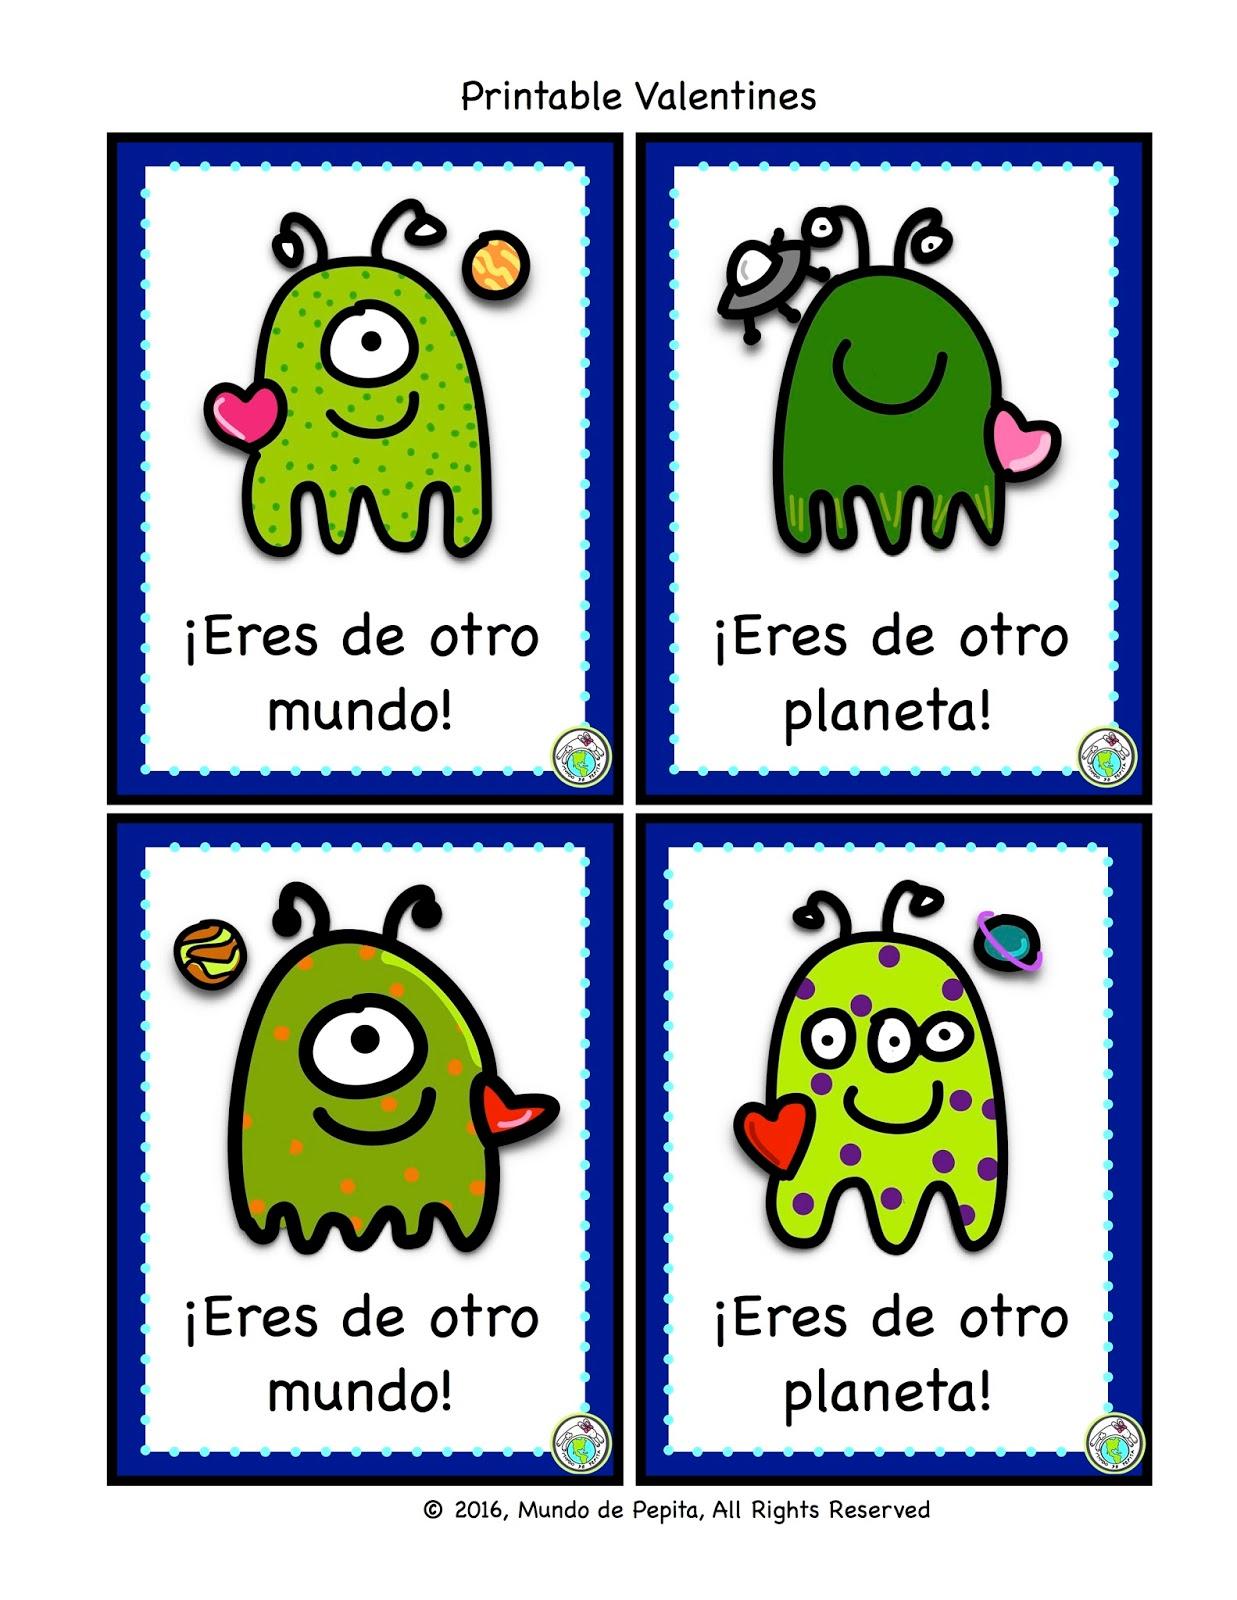 Printable Spanish Valentines For Kids